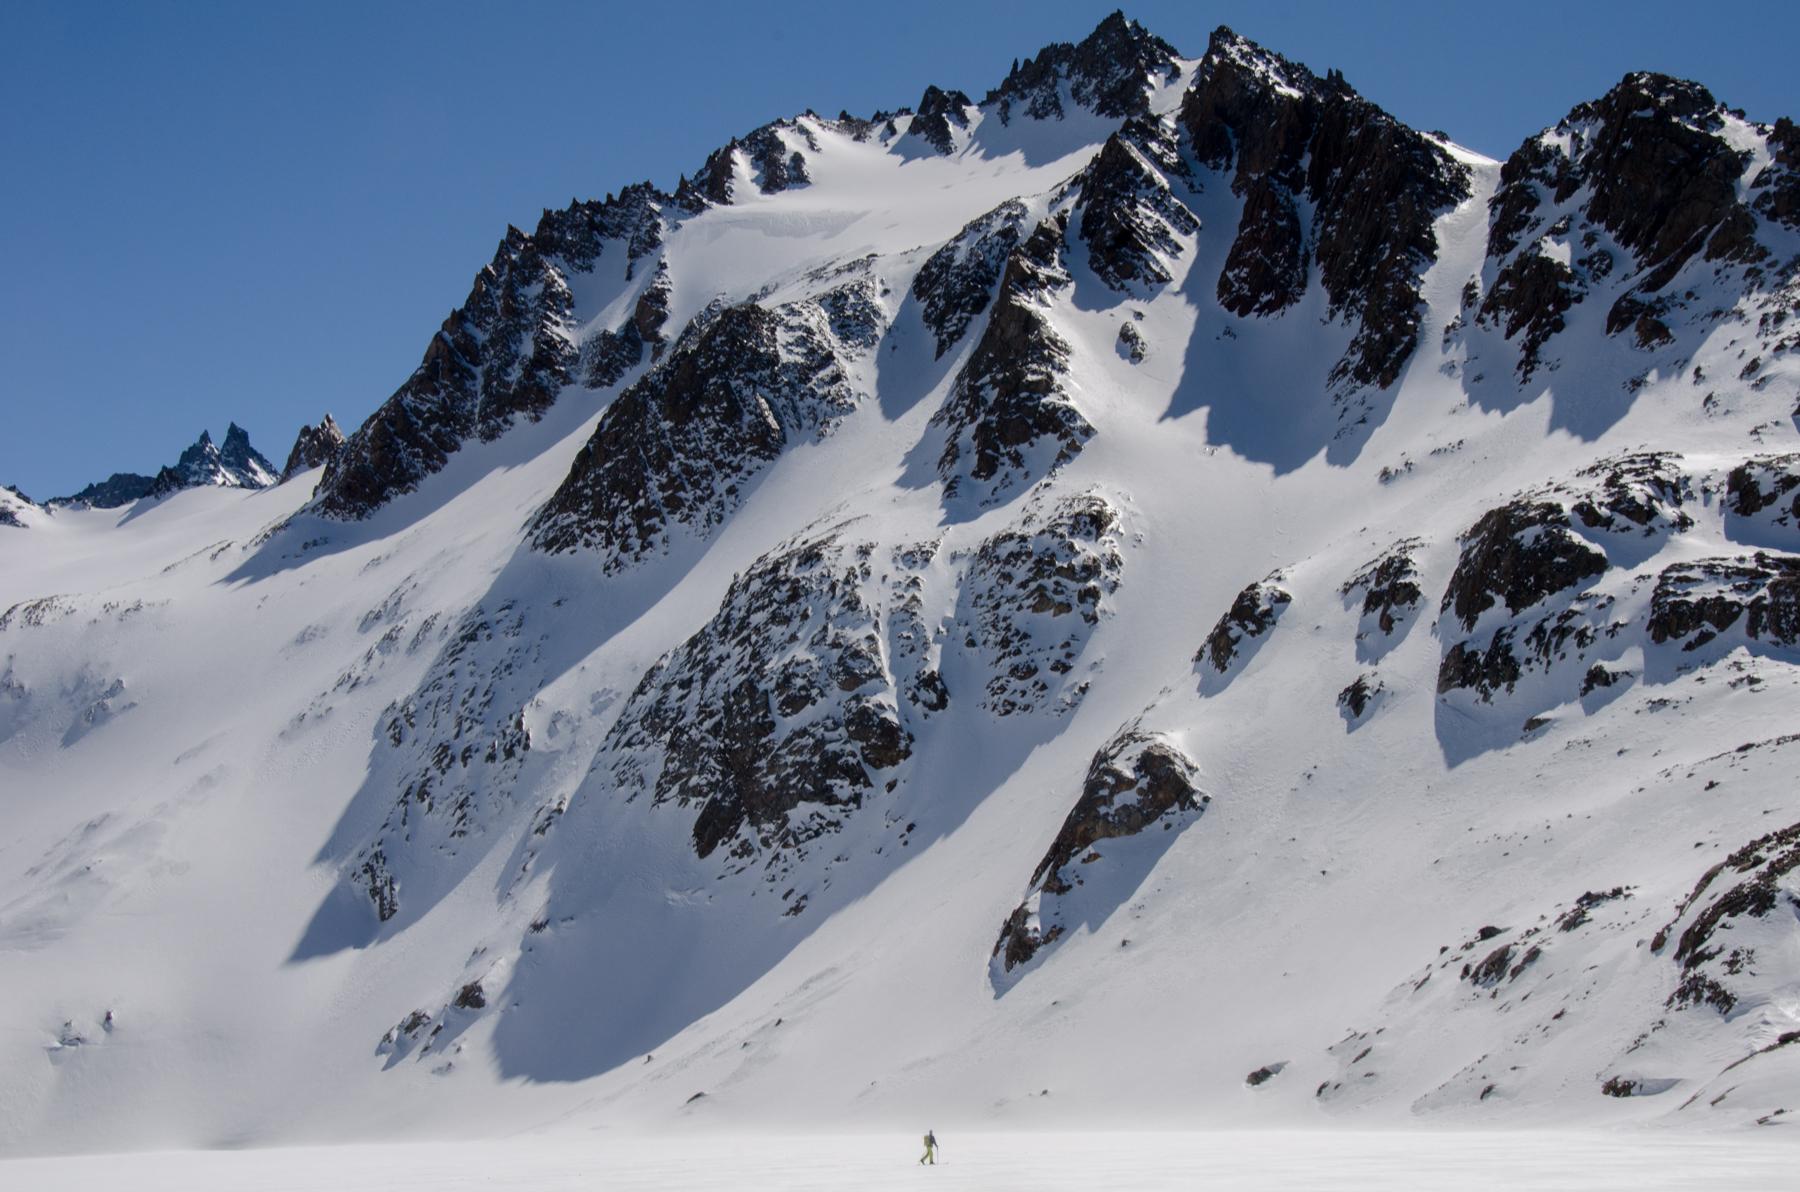 Mount Fitz Roy, El Chalten, Patagonia